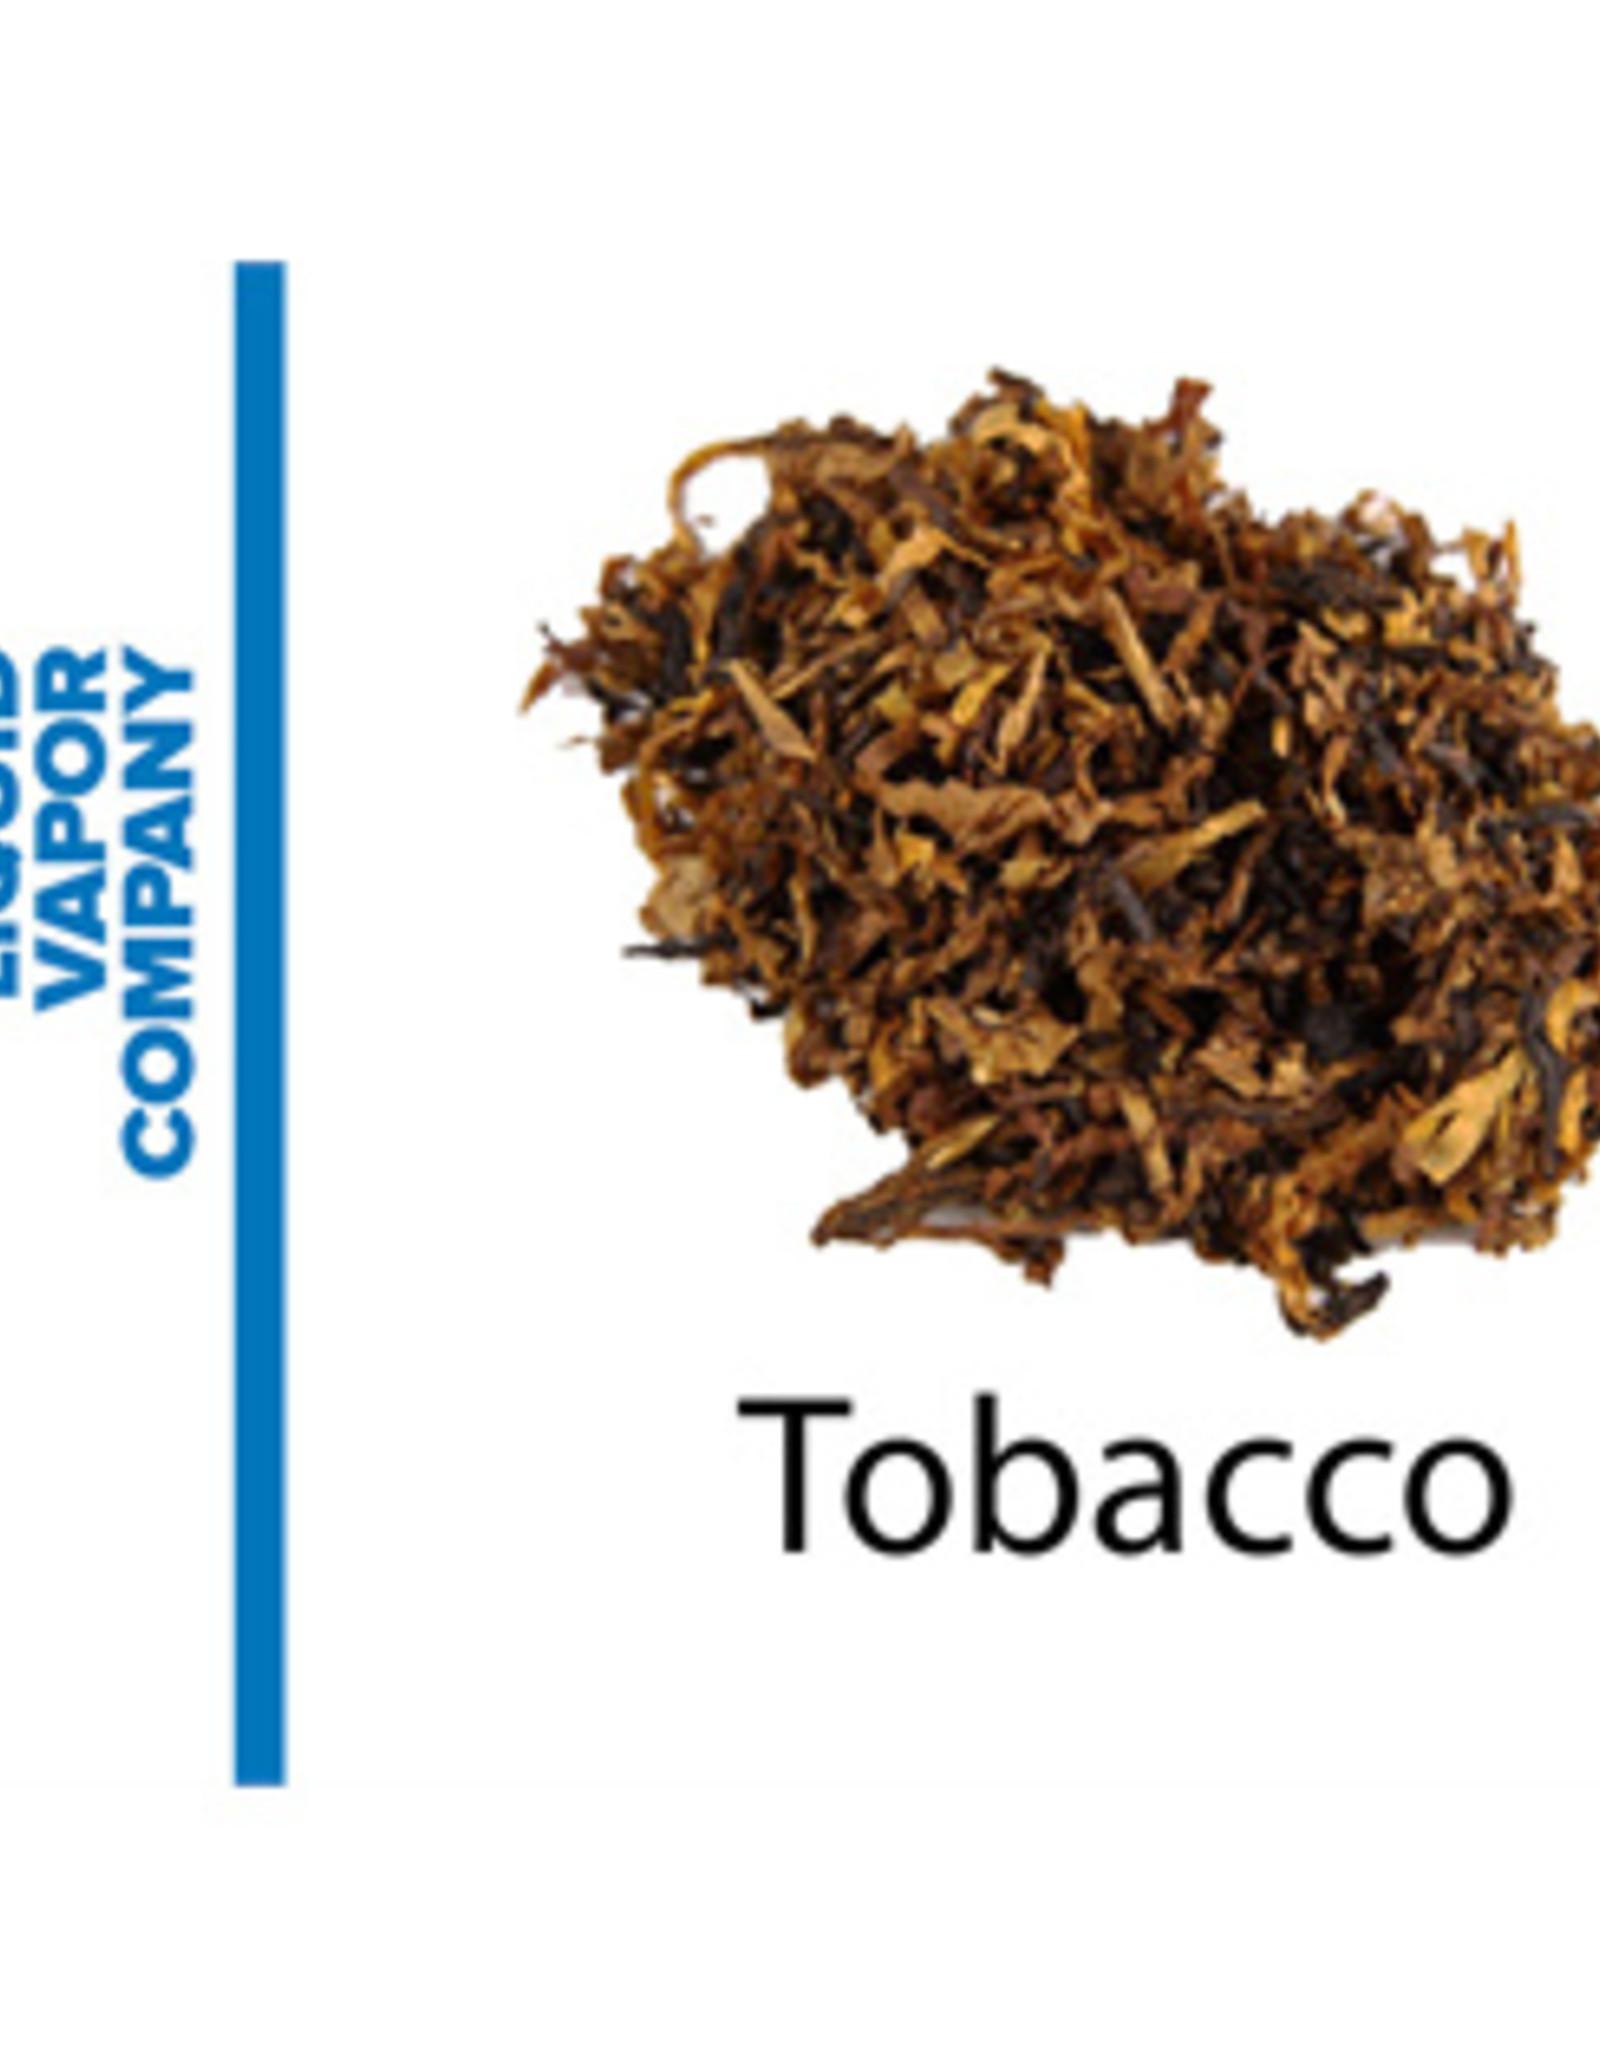 Speens Speens E-Liquid Tobacco 8 mg nicotine